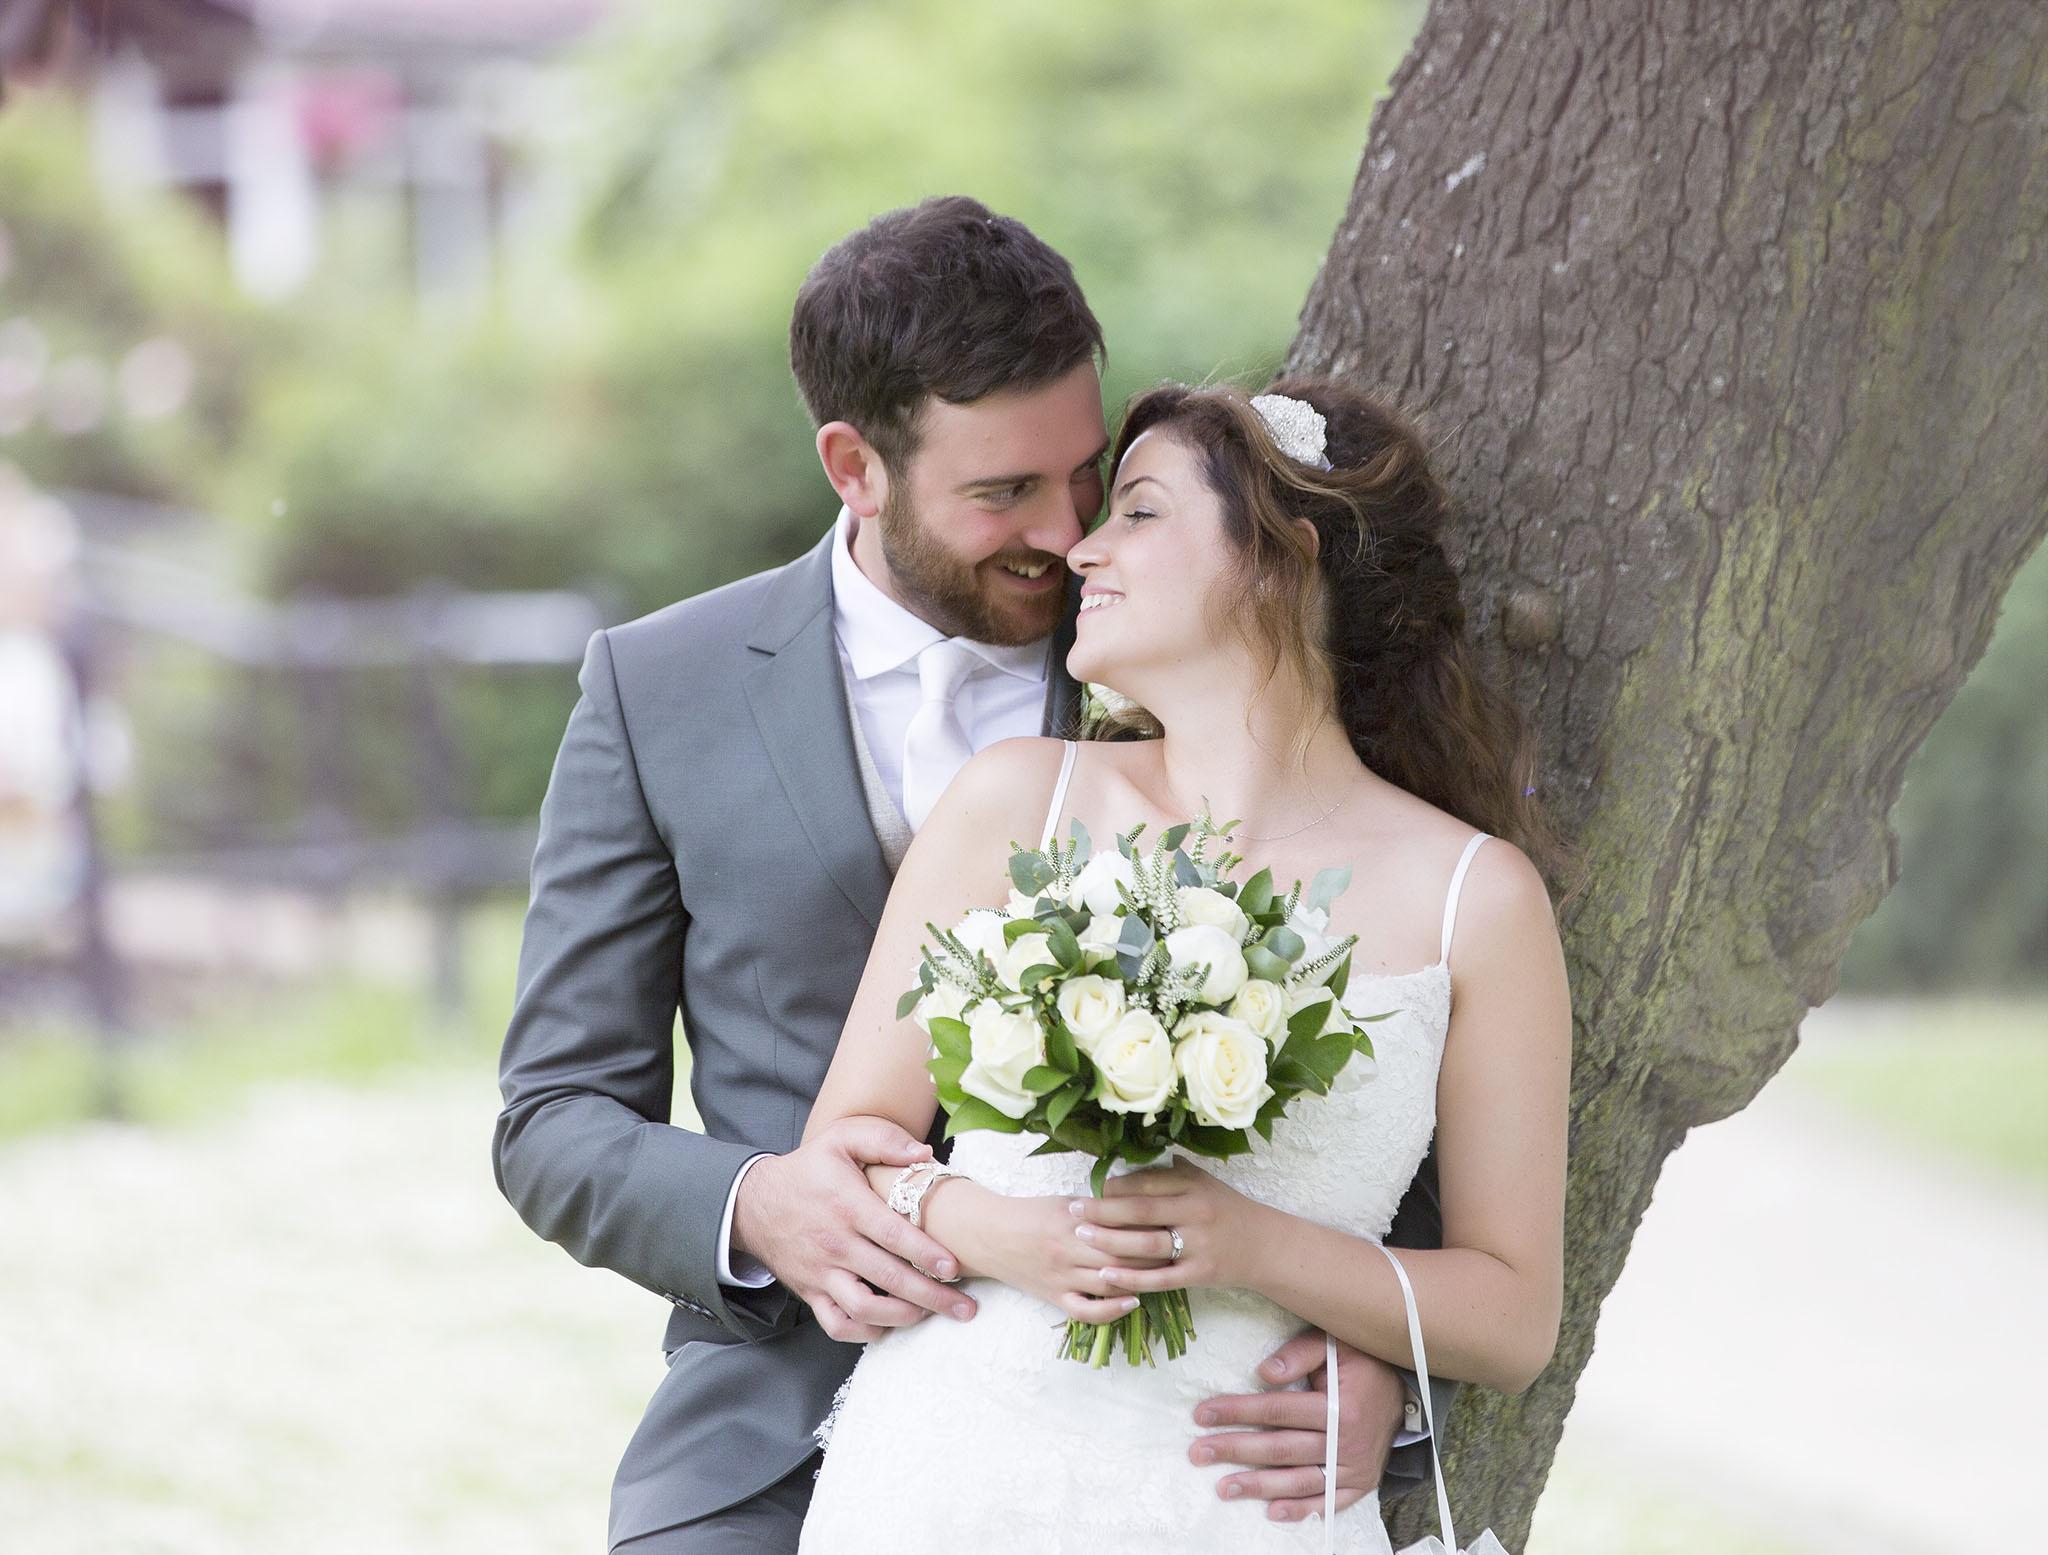 elizabethgphotography_kingslangley_hertfordshire_fineart_wedding_enfield_ricky_nicole_nahlis_55.jpg